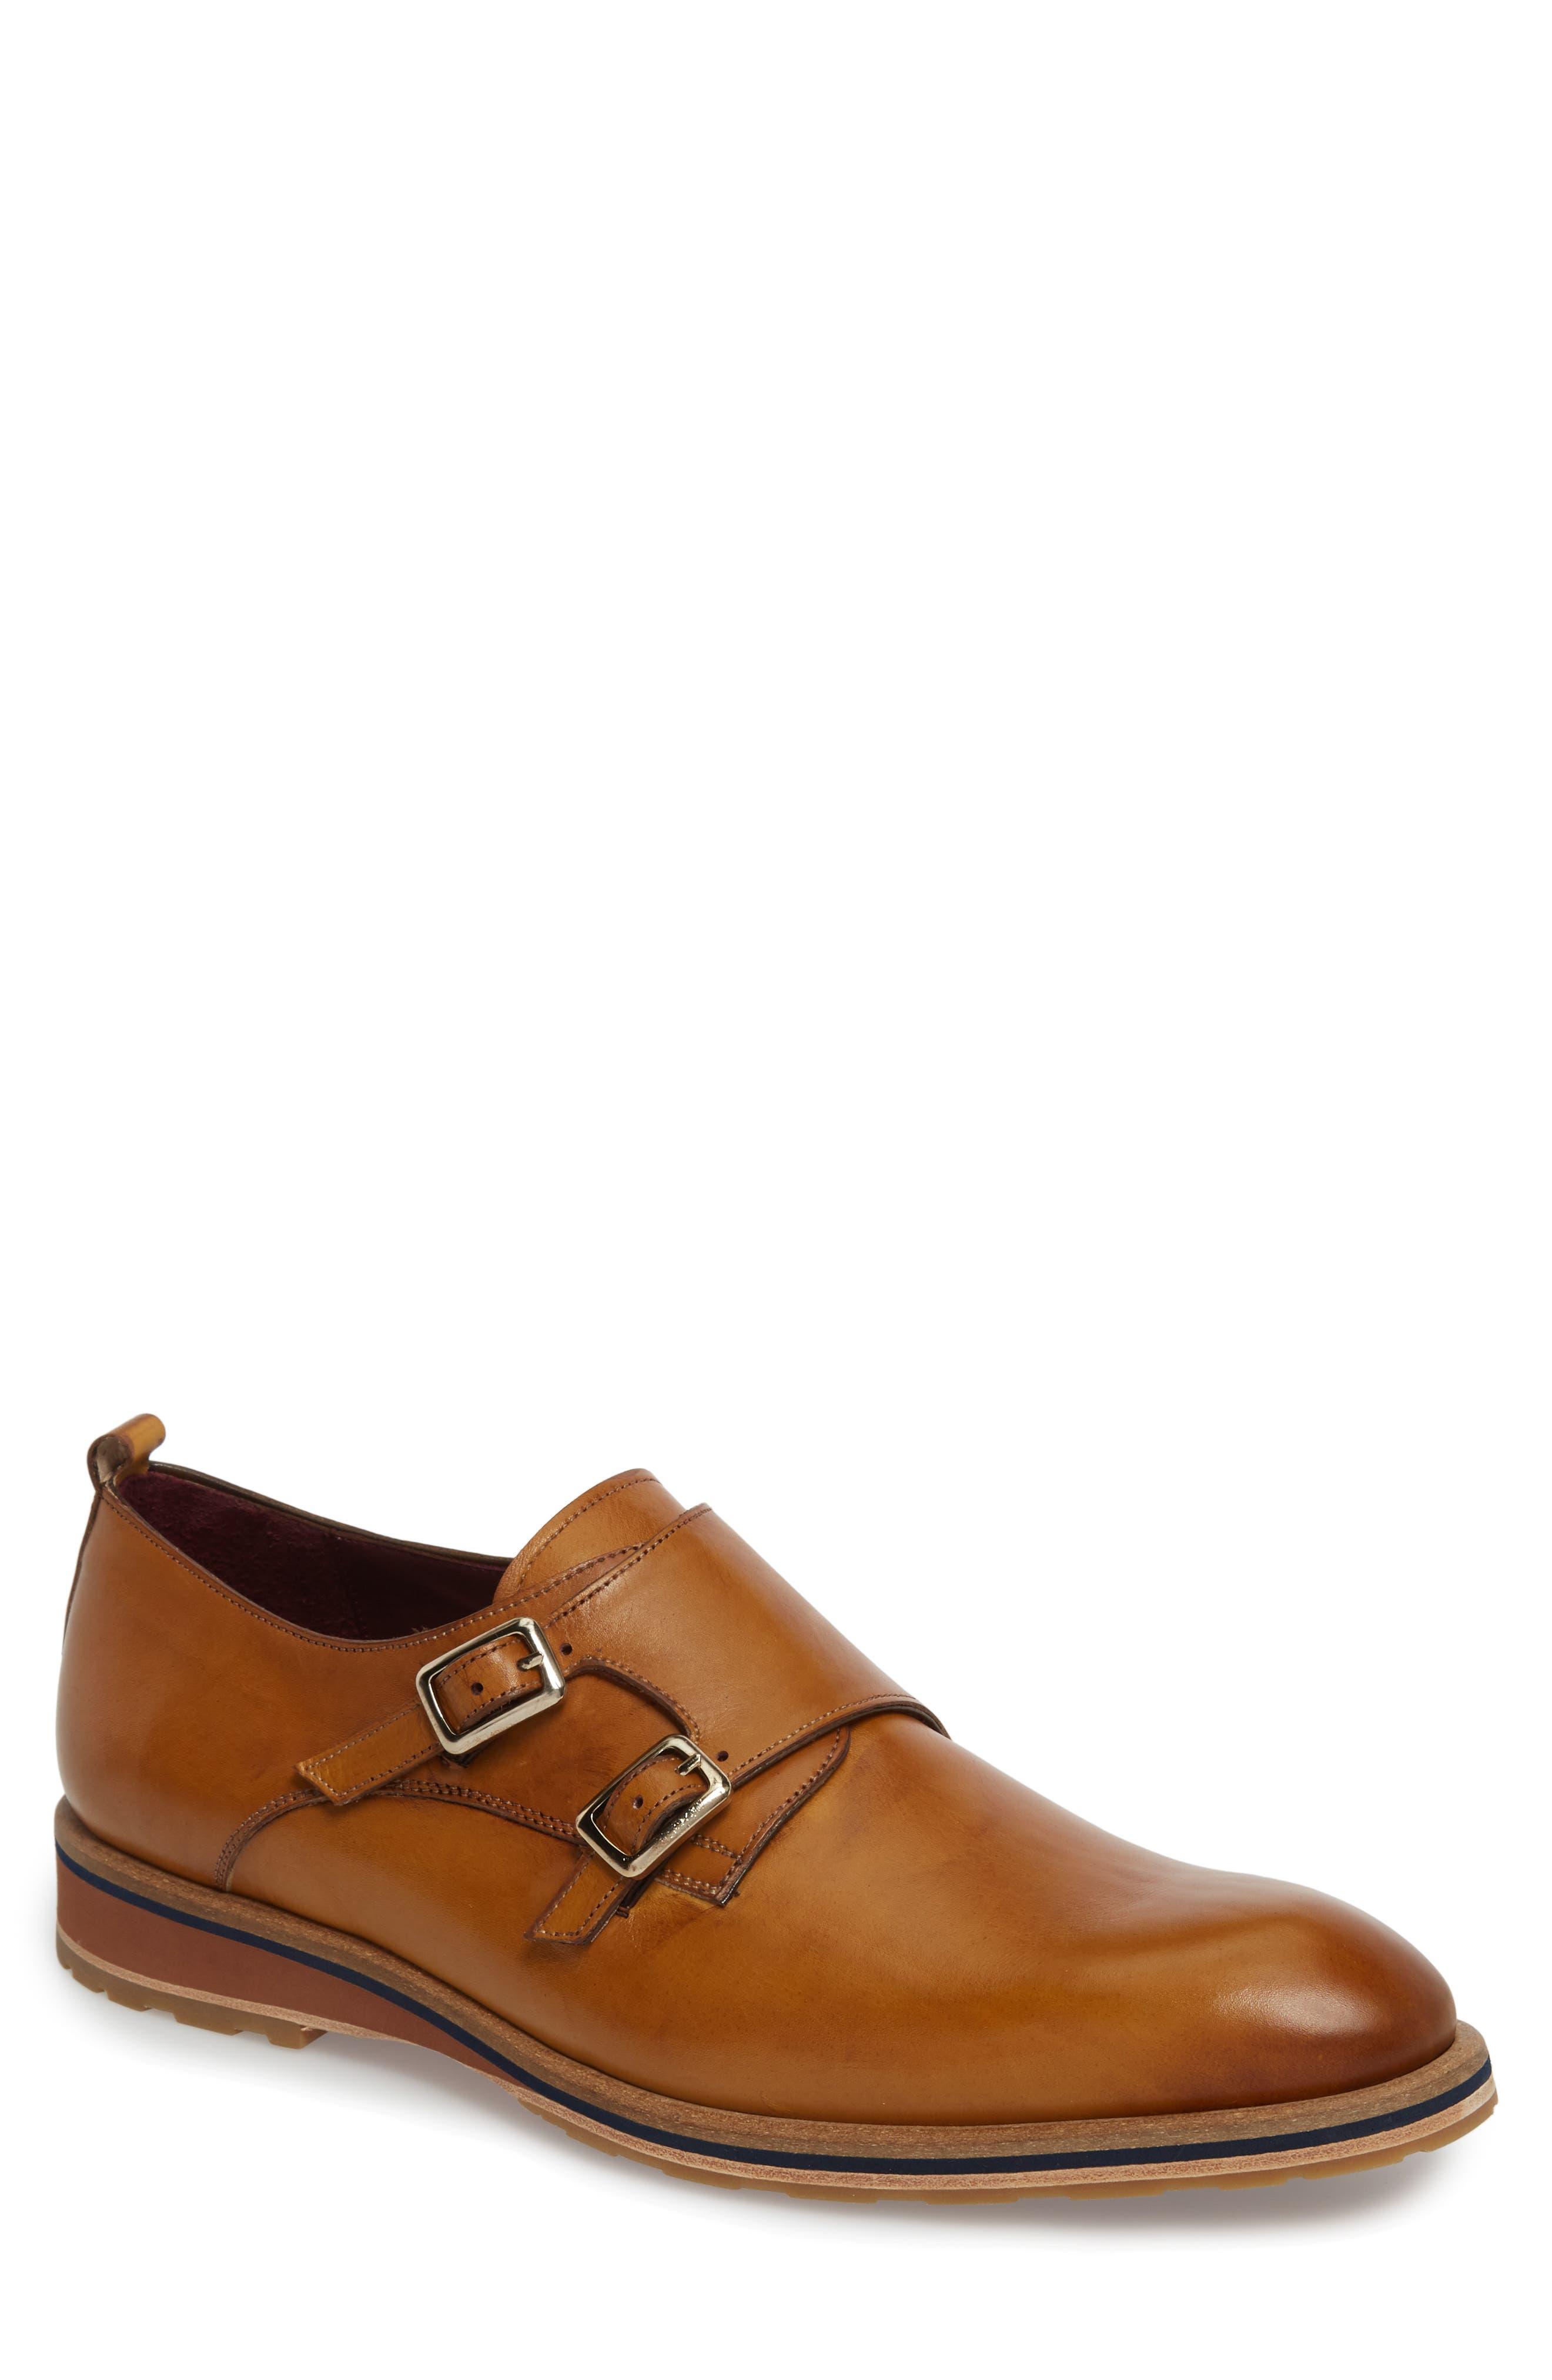 Apolo Double Buckle Monk Shoe,                         Main,                         color, HONEY LEATHER